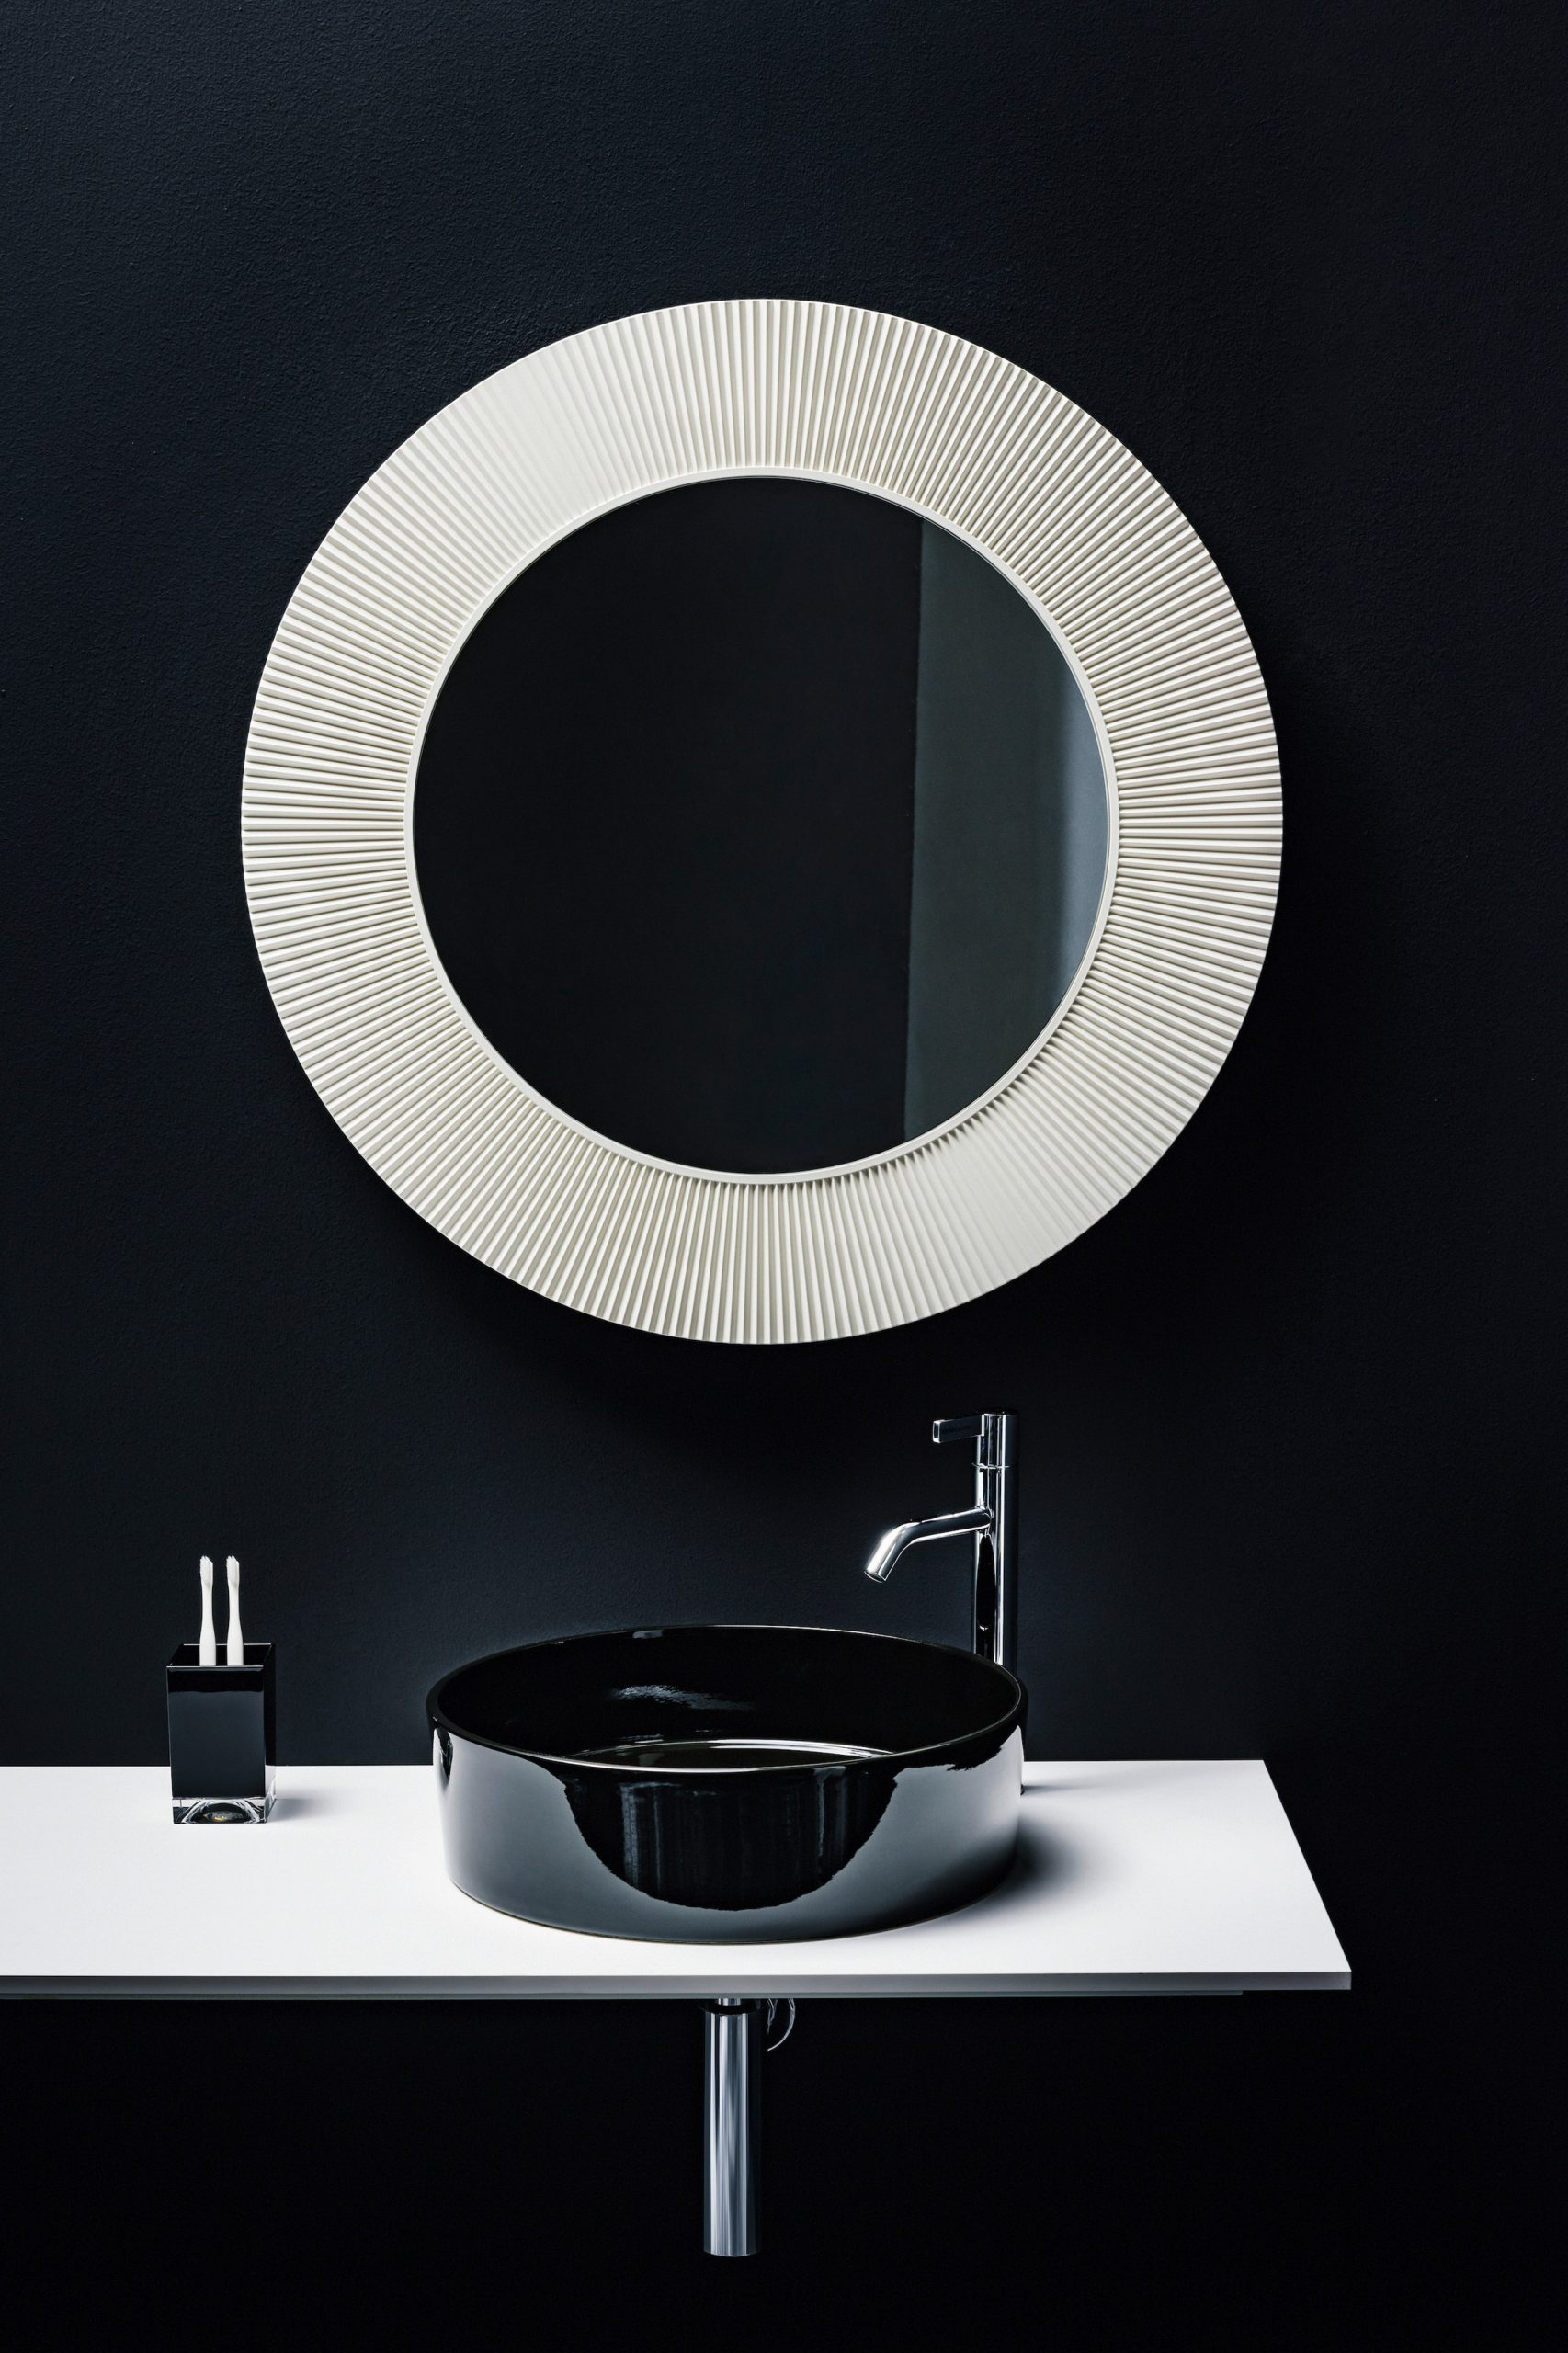 A circular bathroom mirror and sink